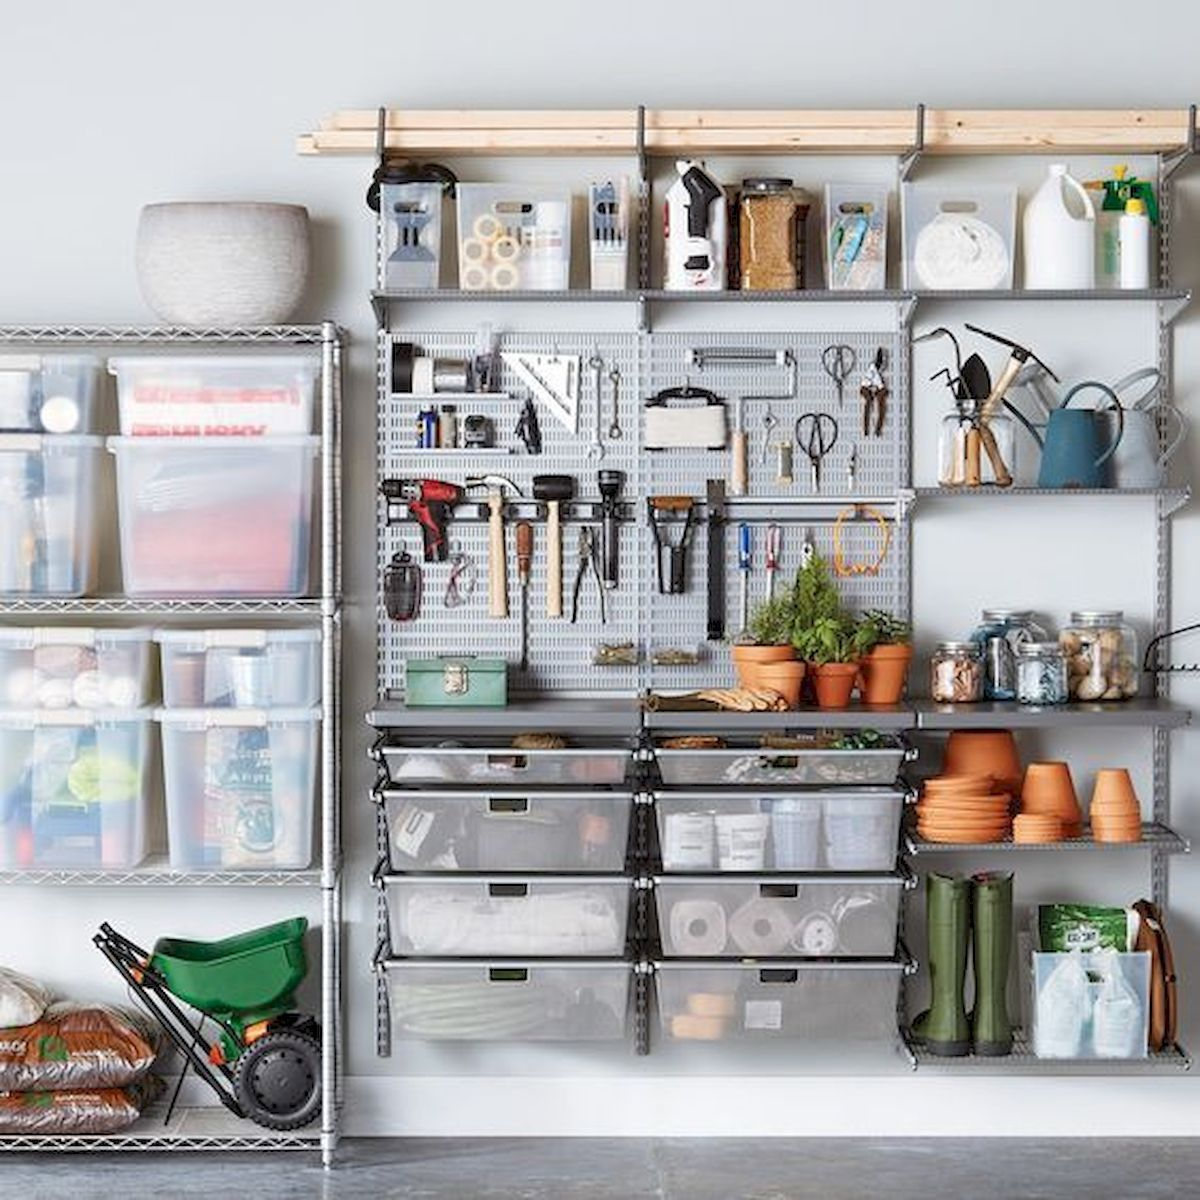 Pin By Julia Rickert On For Jason In 2020 Shop Shelving Garage